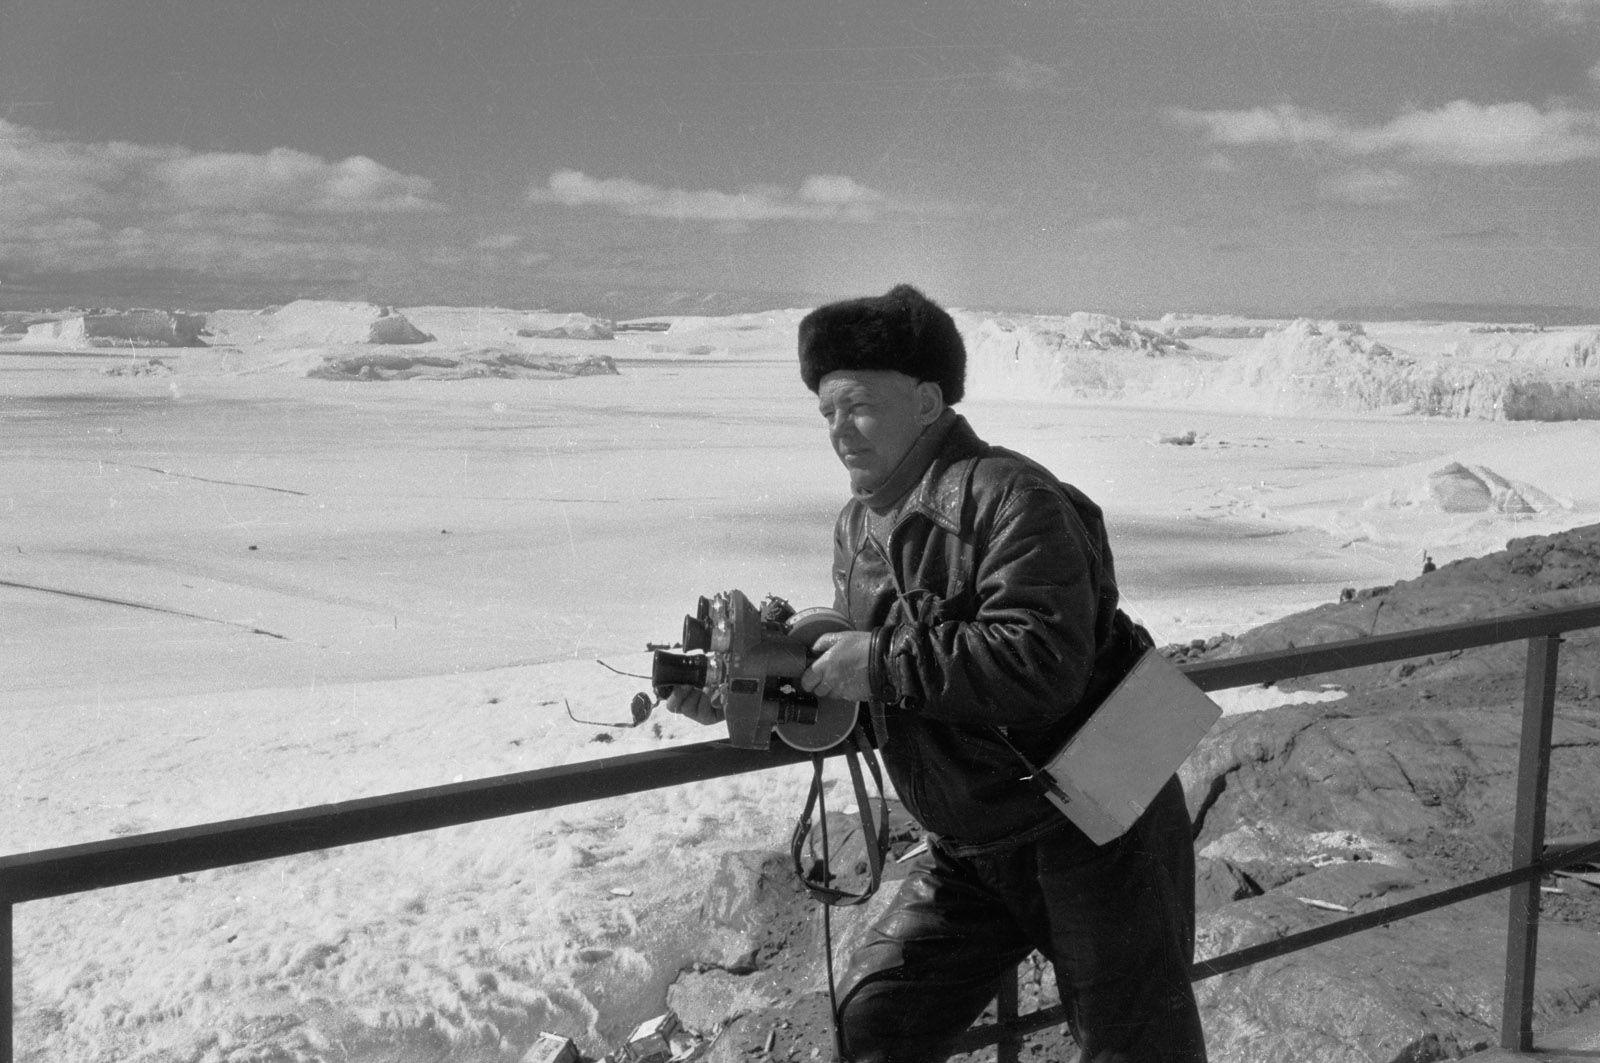 Экспонат #158. Антарктида. Январь 1962 года